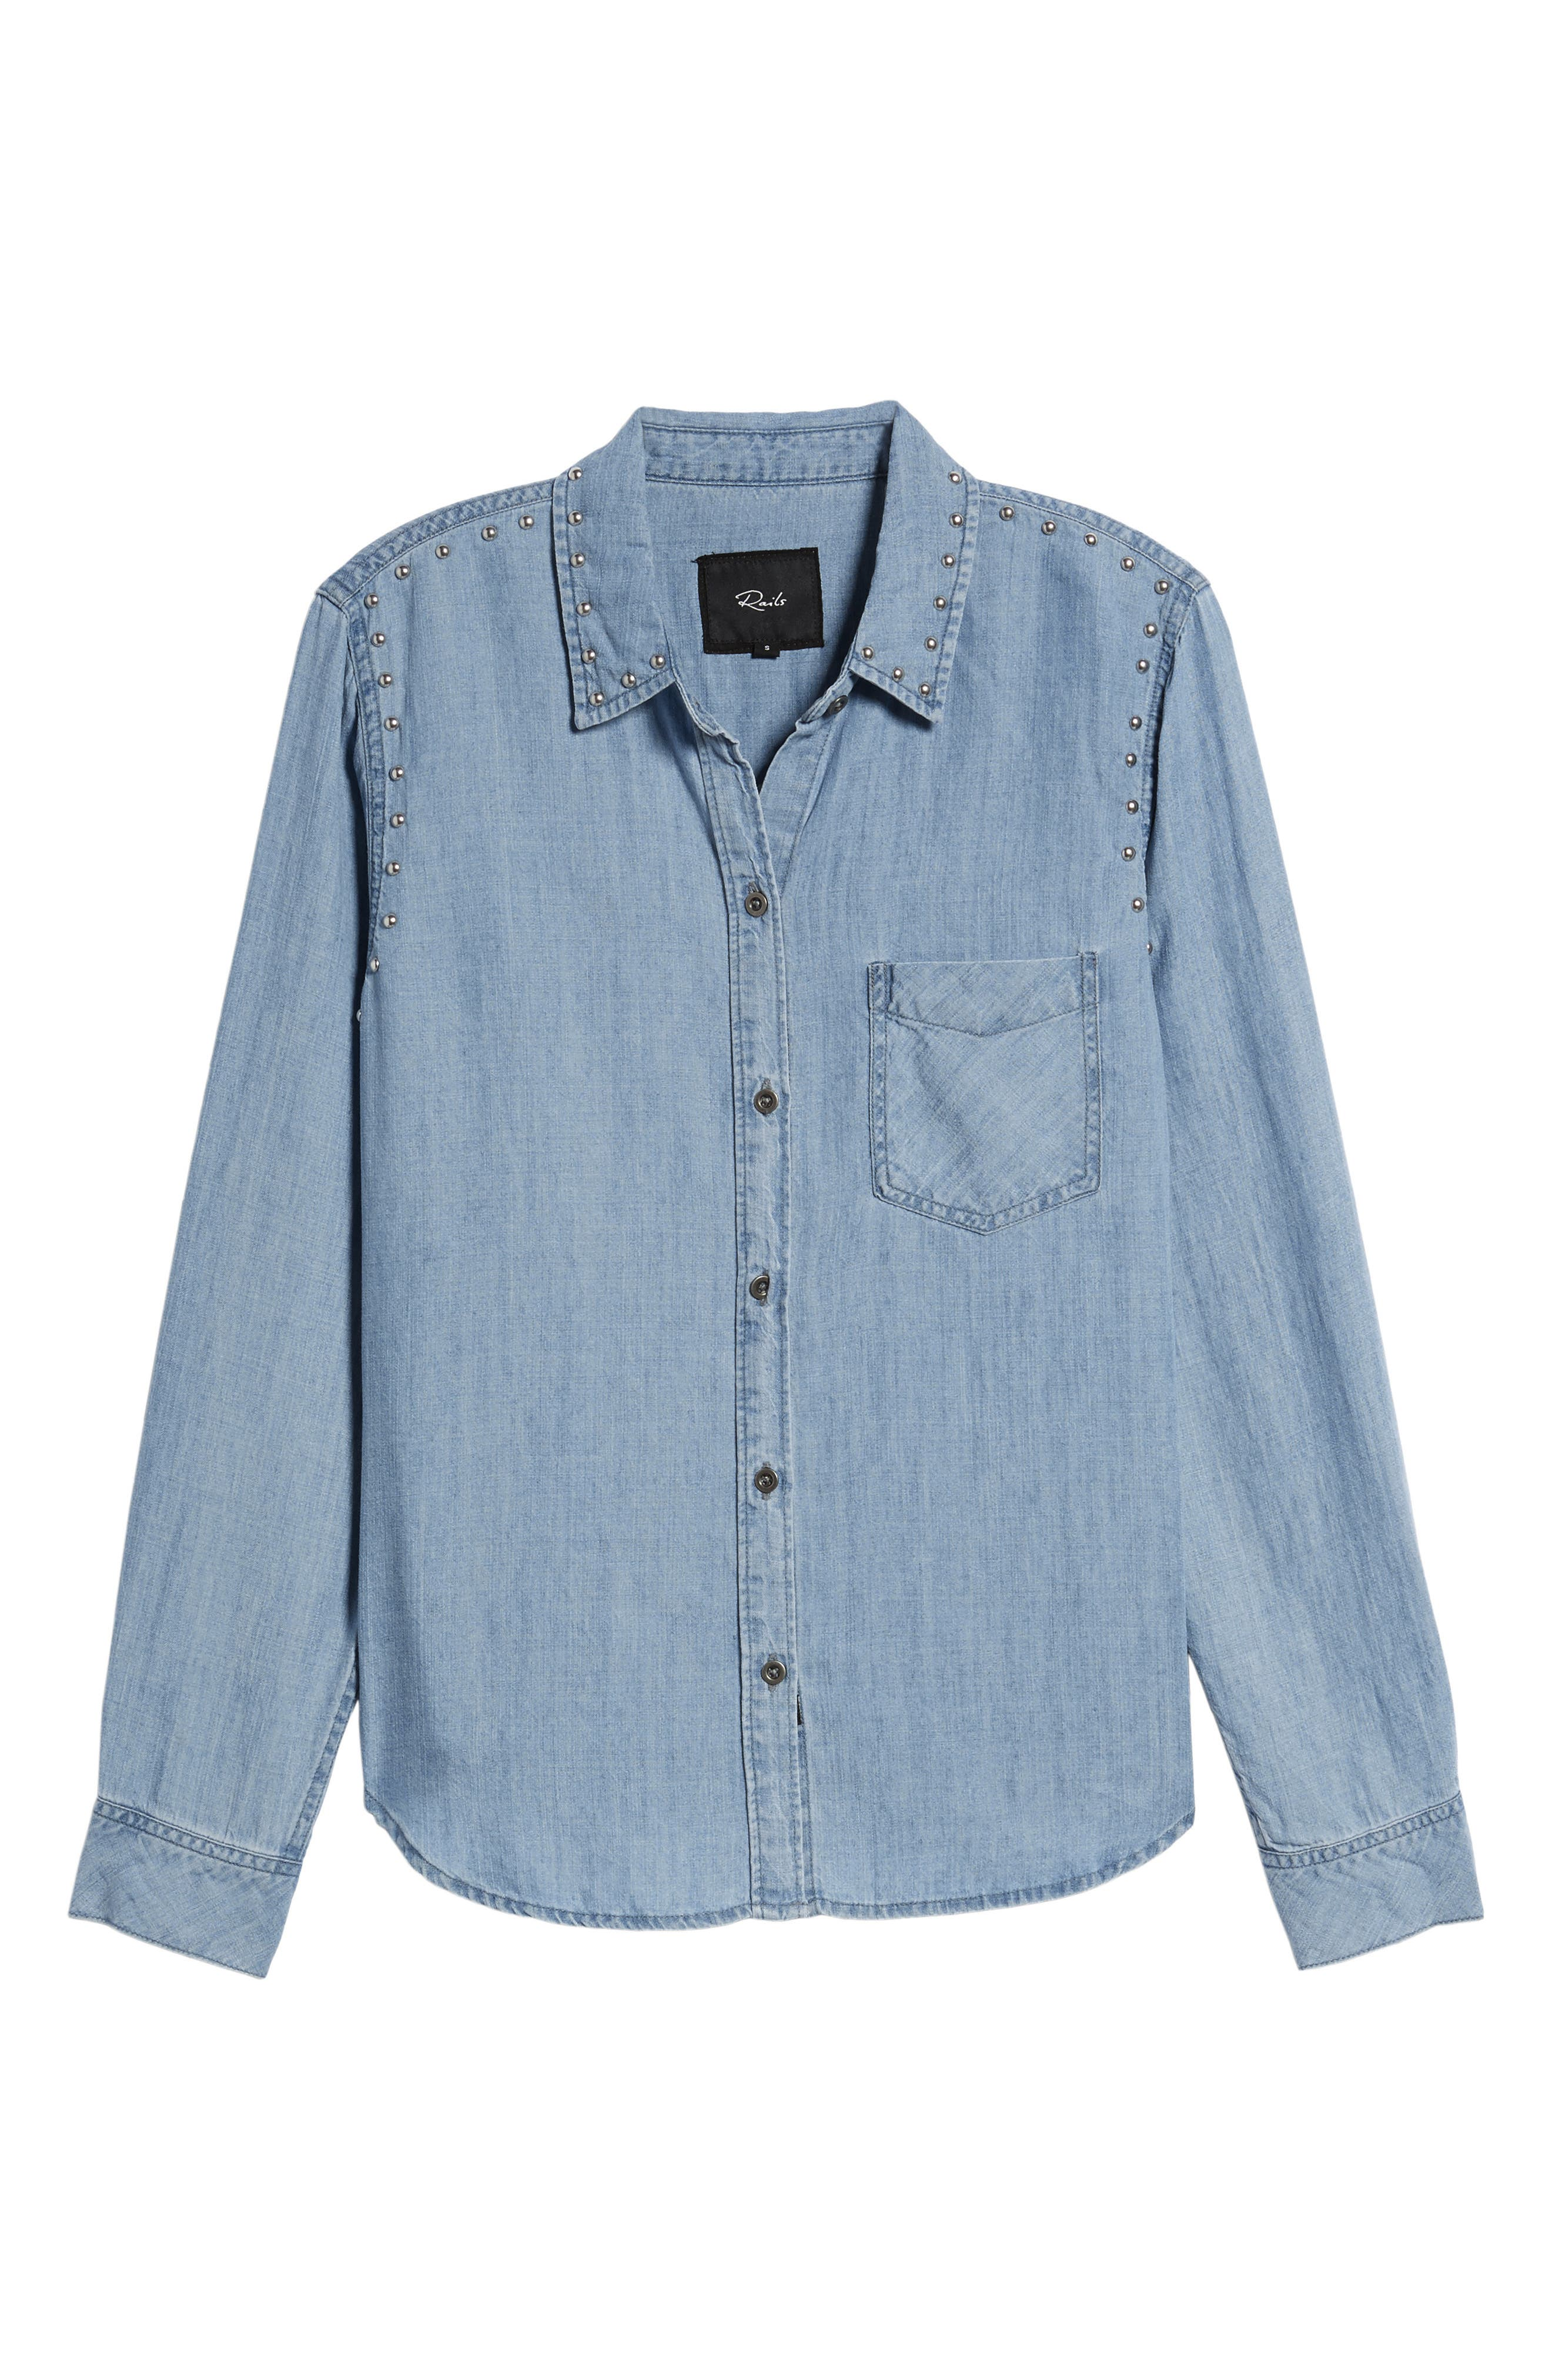 Ingrid Studded Shirt,                             Alternate thumbnail 6, color,                             493